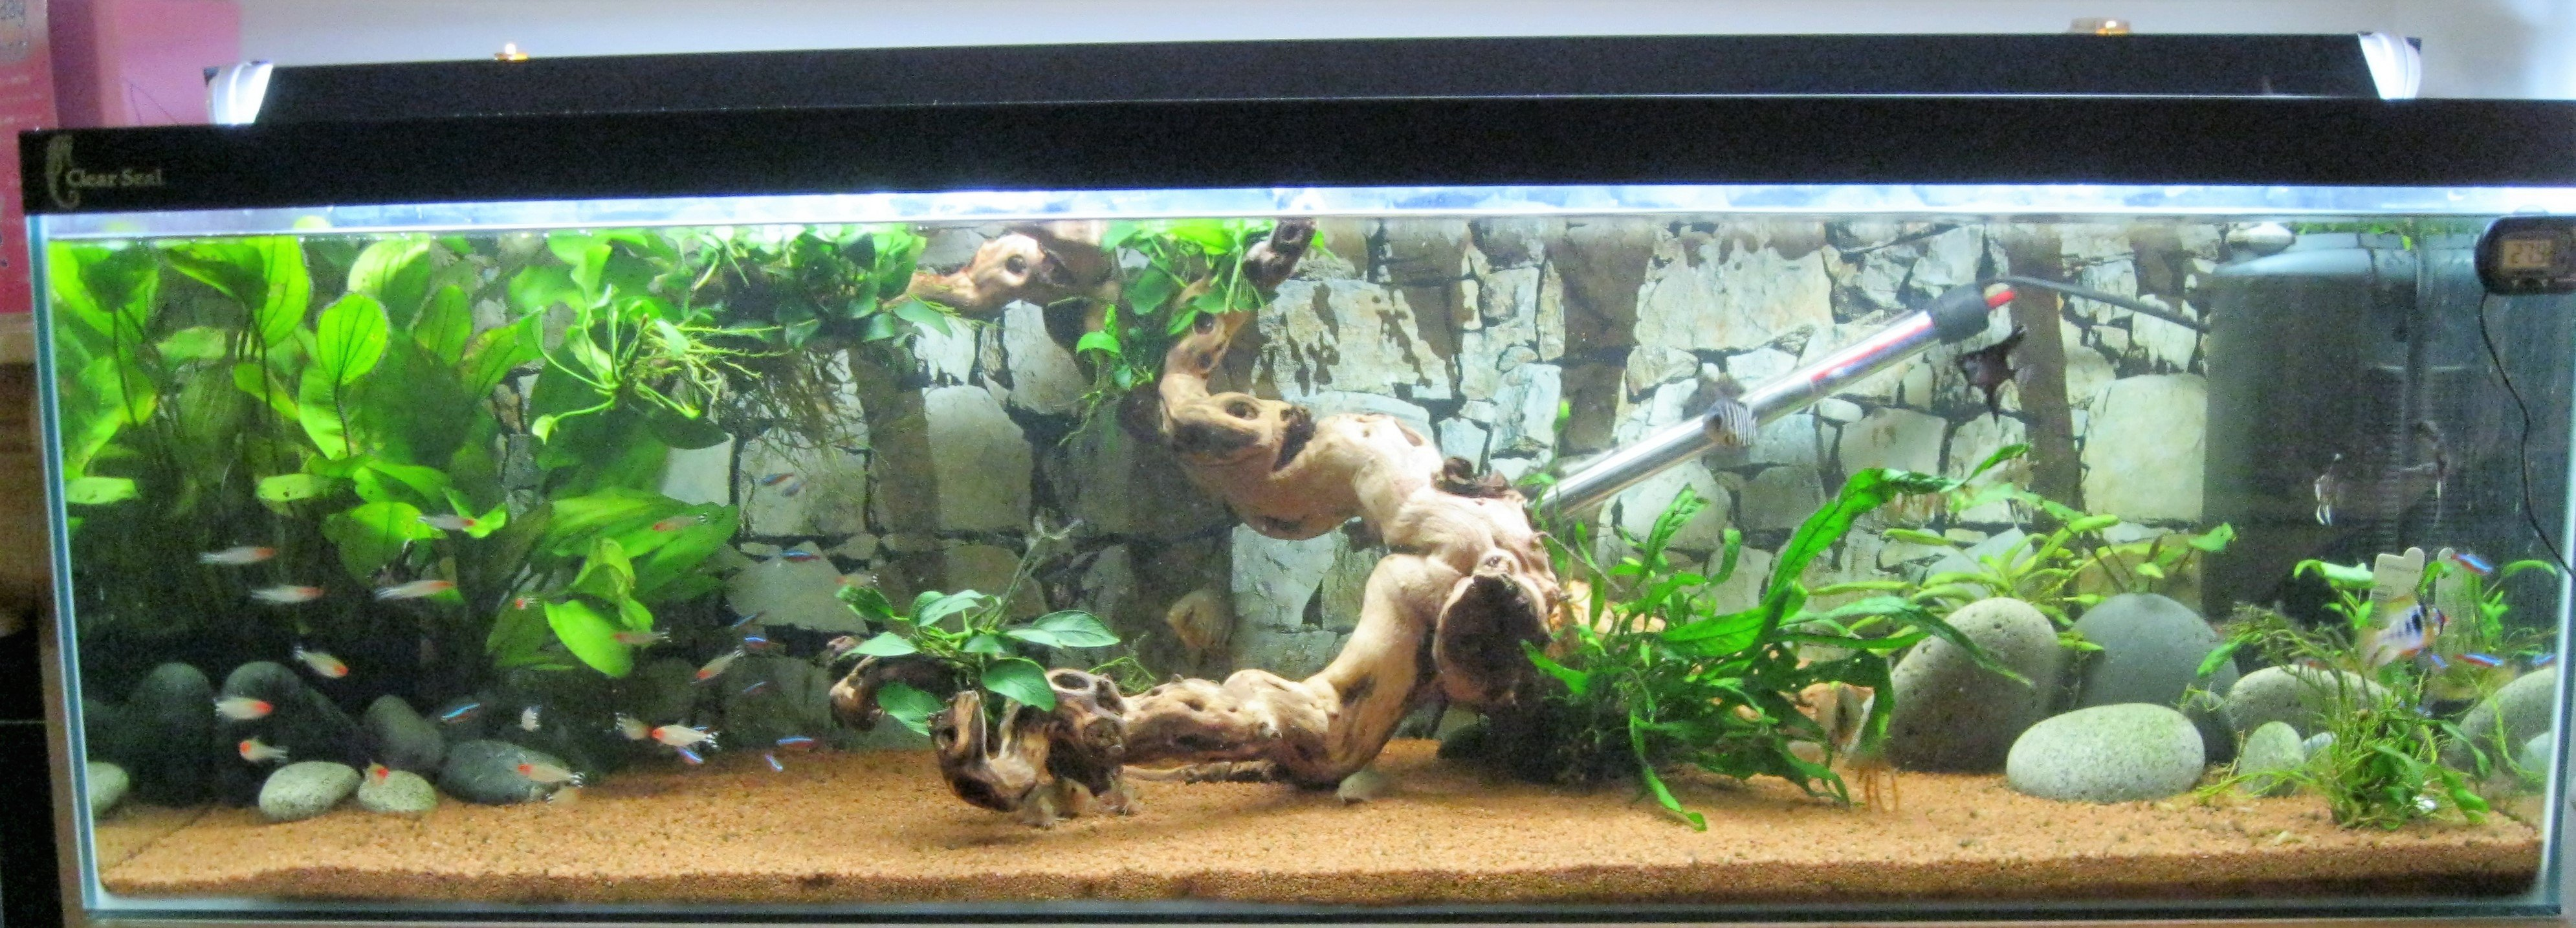 Living Room Tank